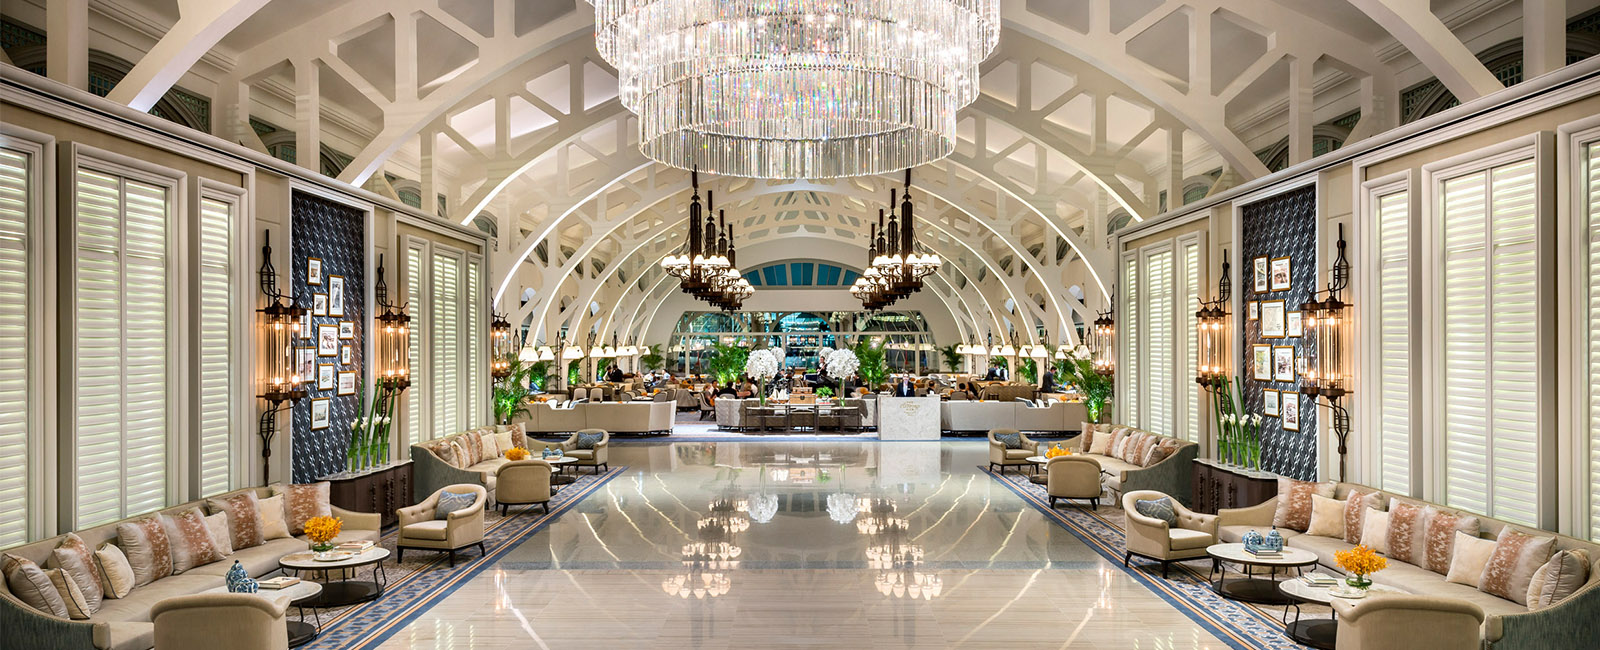 Photo Credit: The Fullerton Bay Hotel Singapore